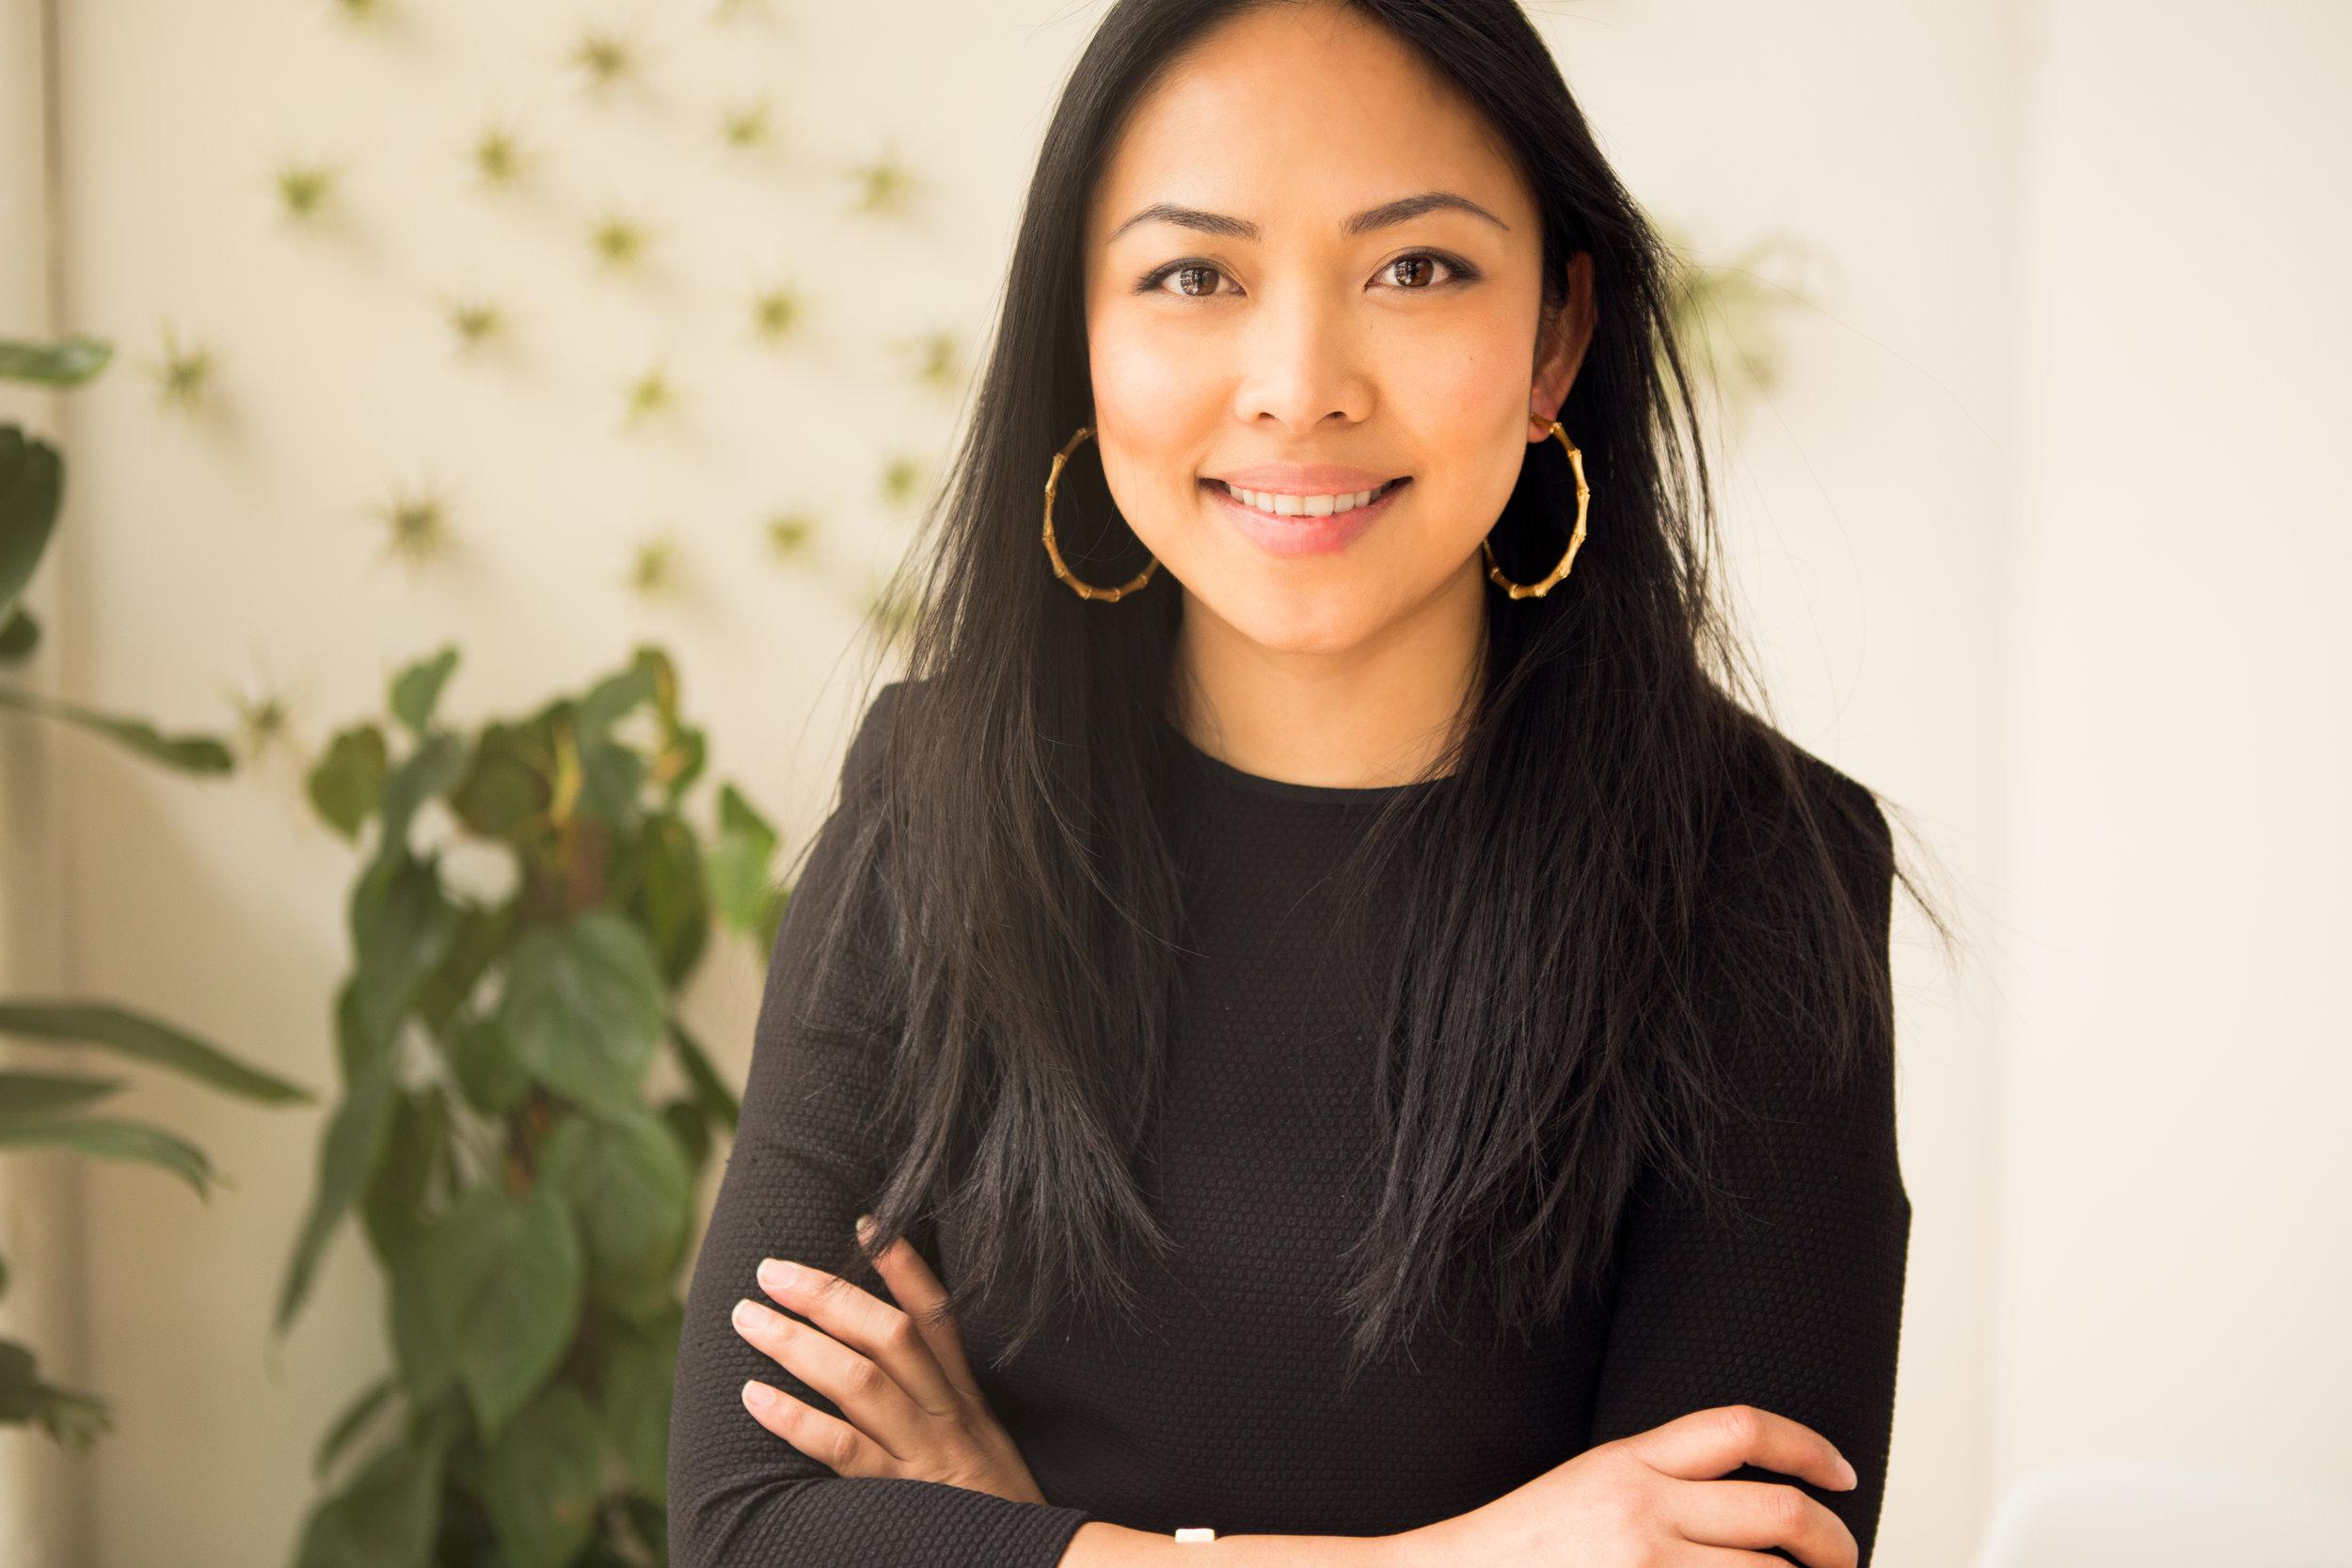 The Beginner's Guide to Fundraising - Diana Melencio